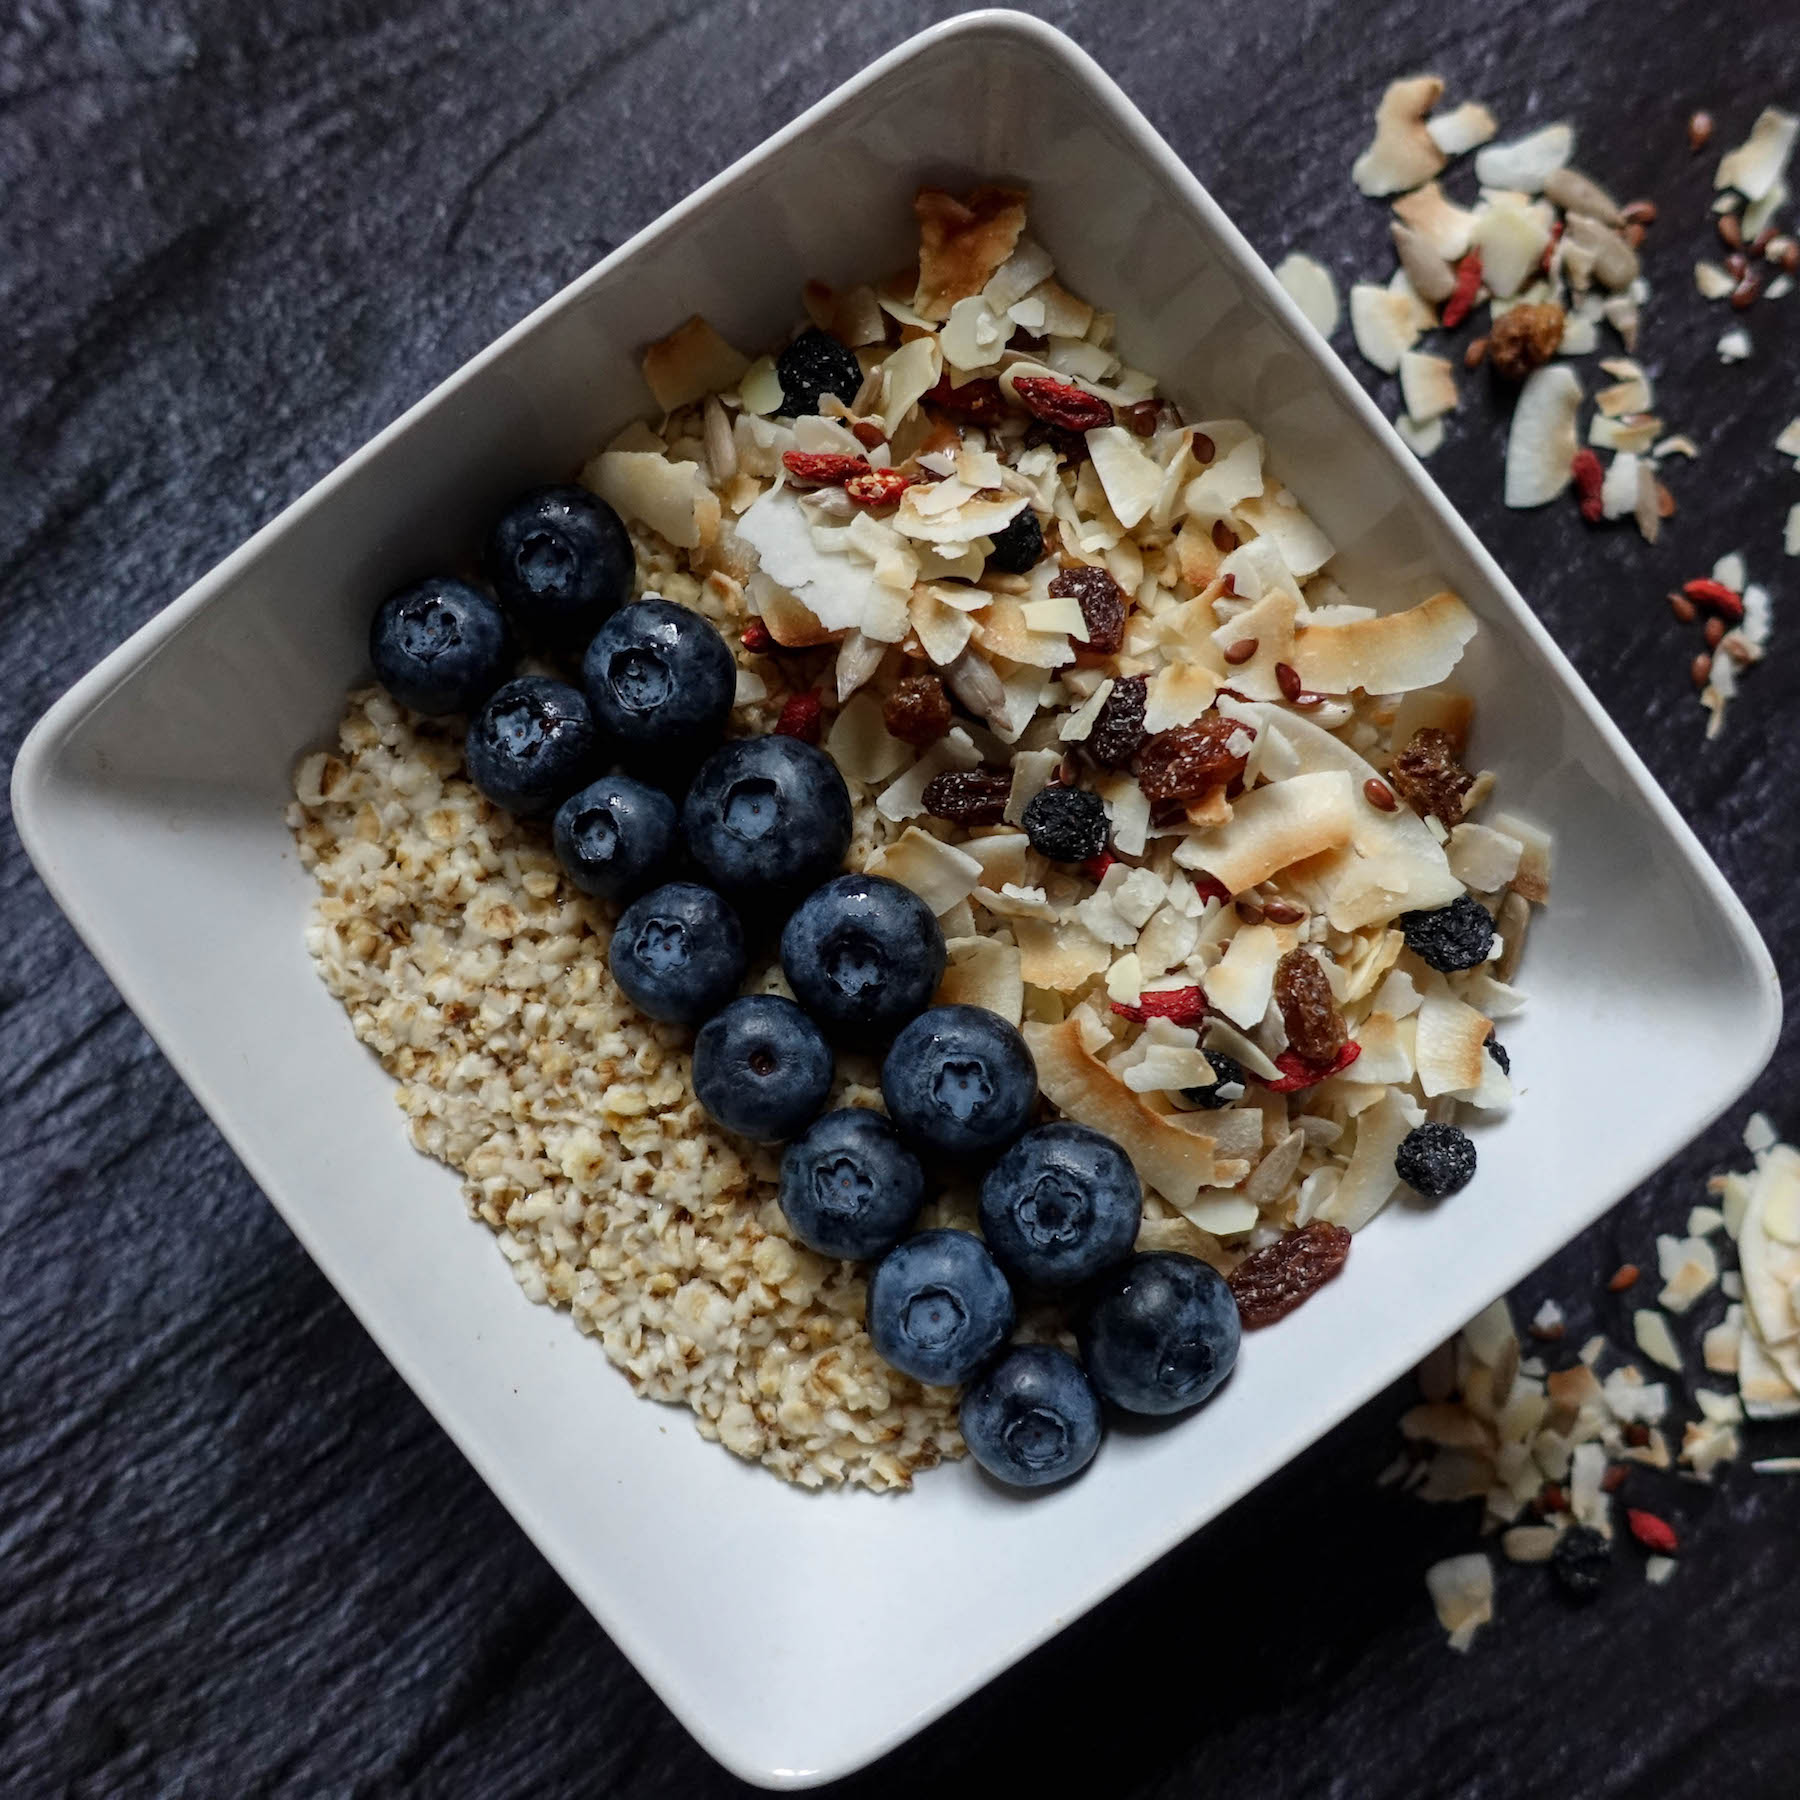 Porridge glutenfrei suelovesnyc_susan_fengler_glutenfreies_porridge_glutenfrei